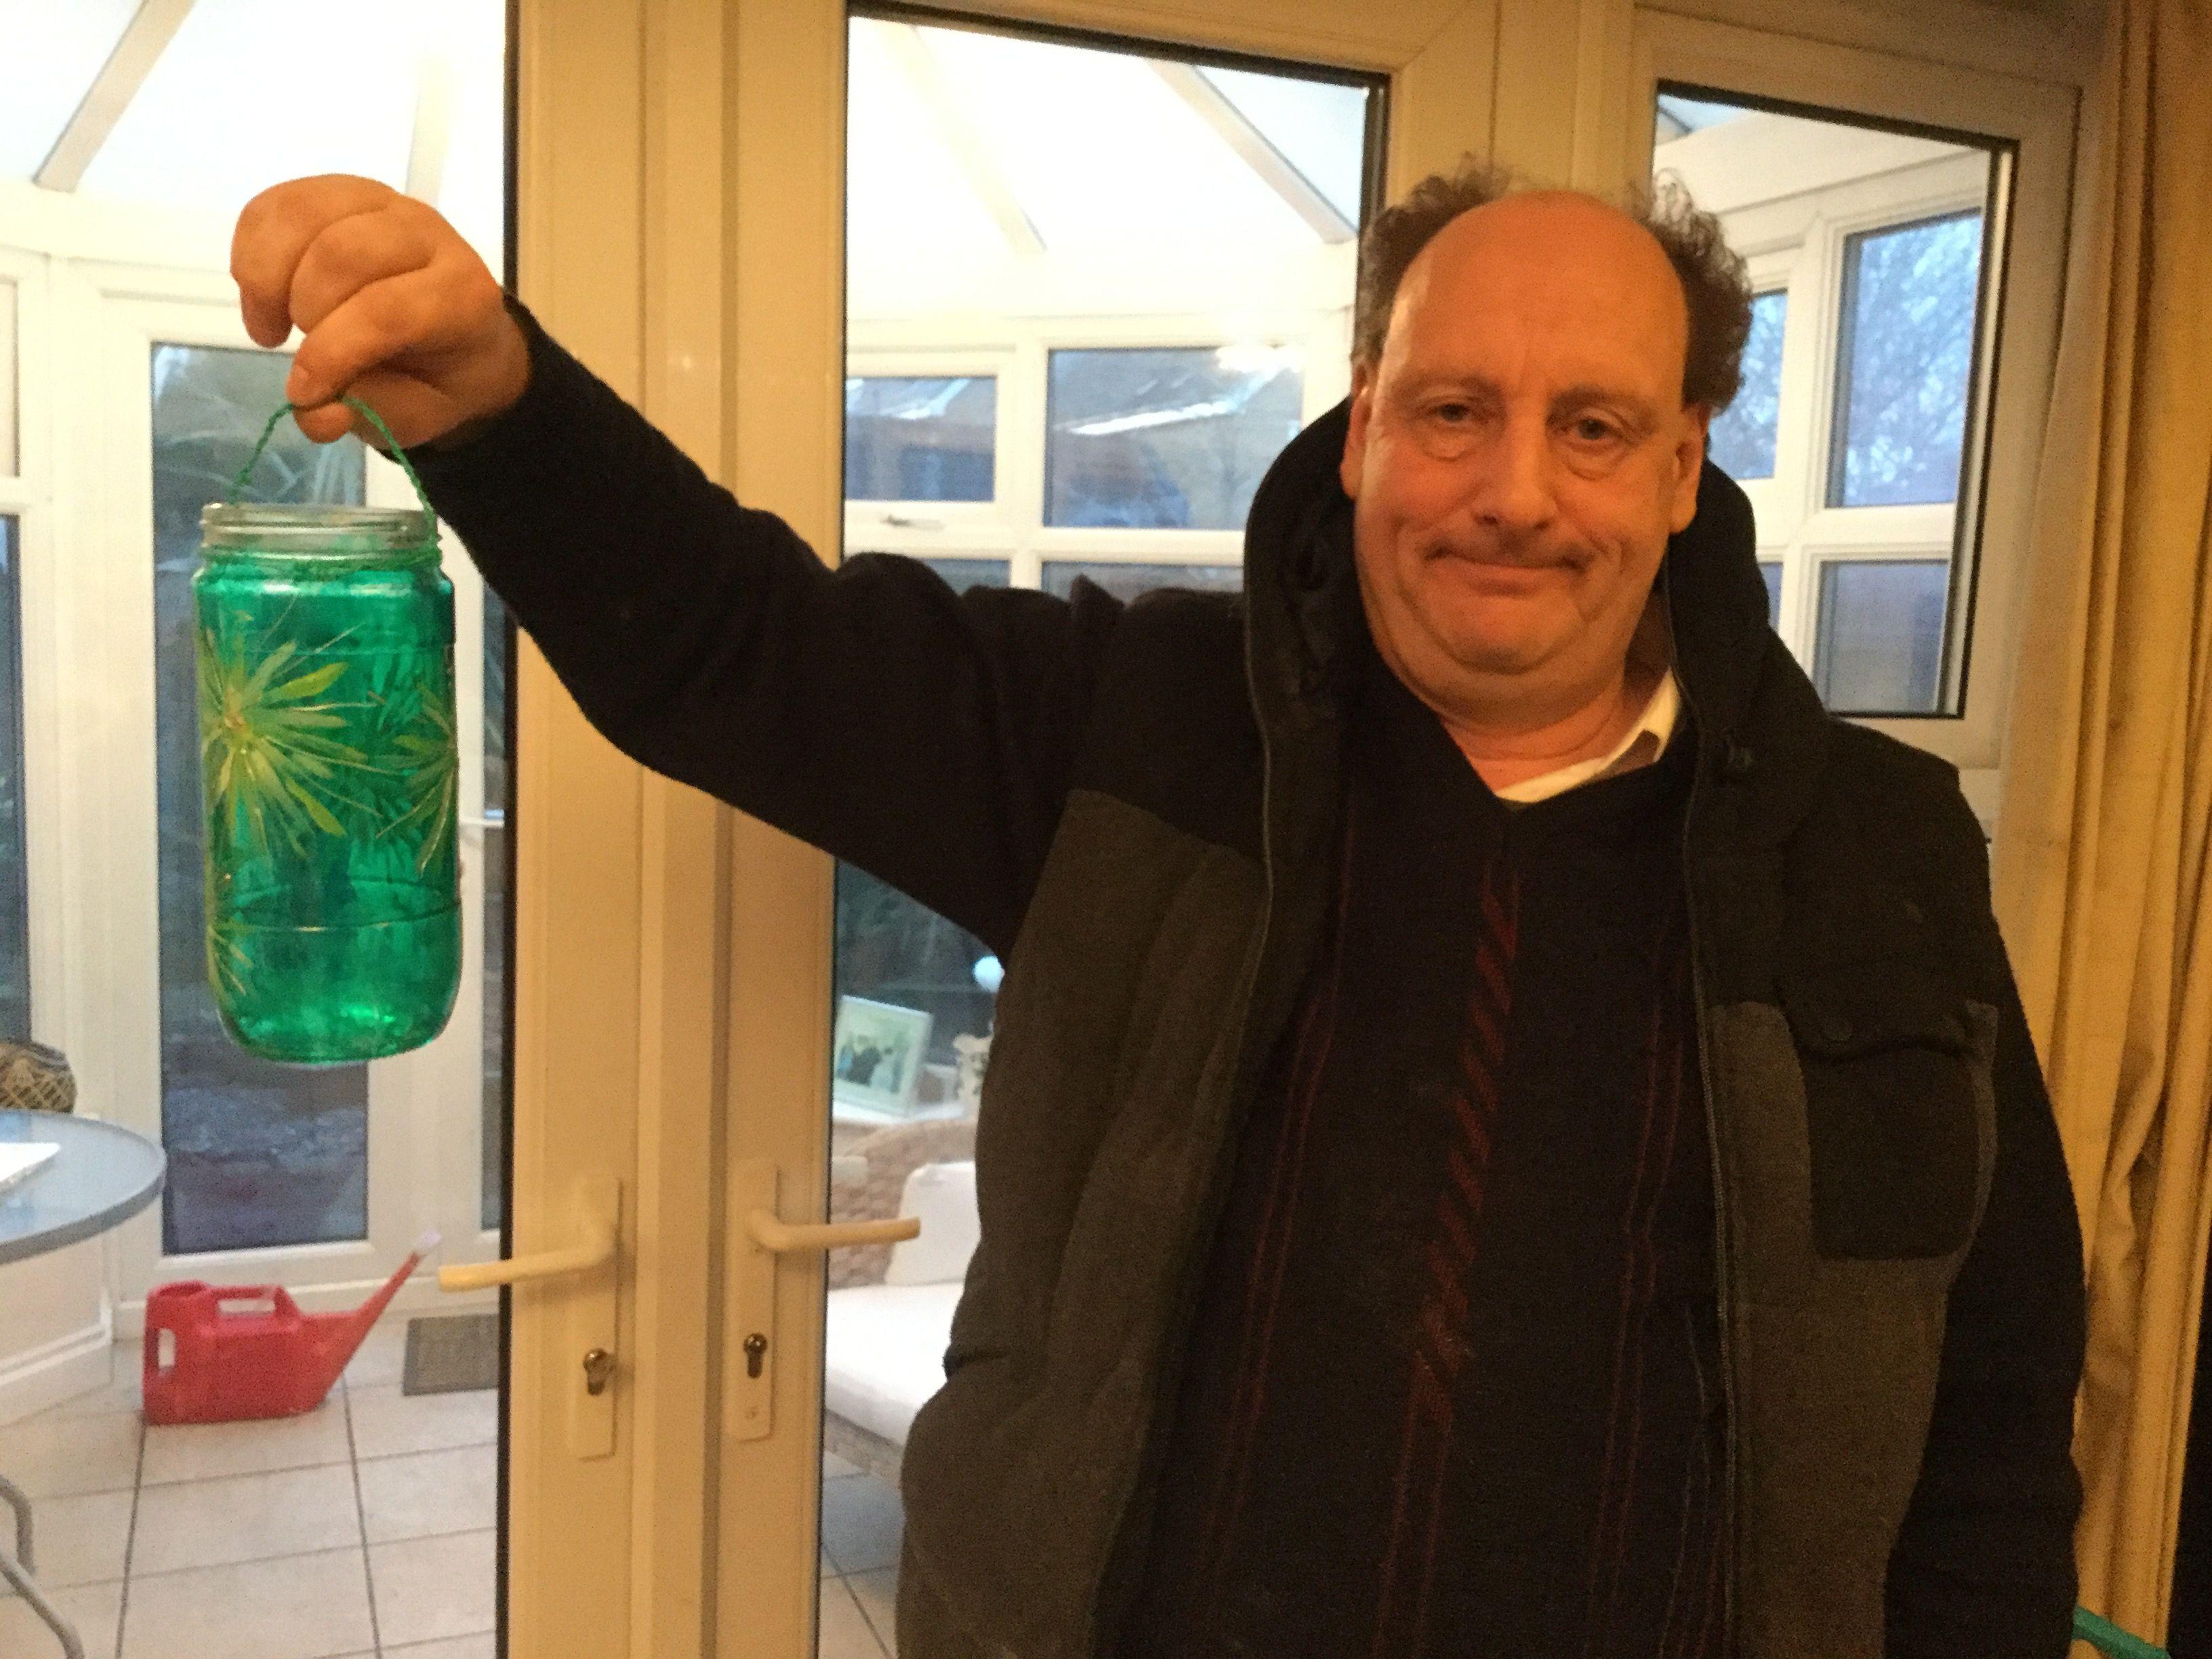 Brian's green jar